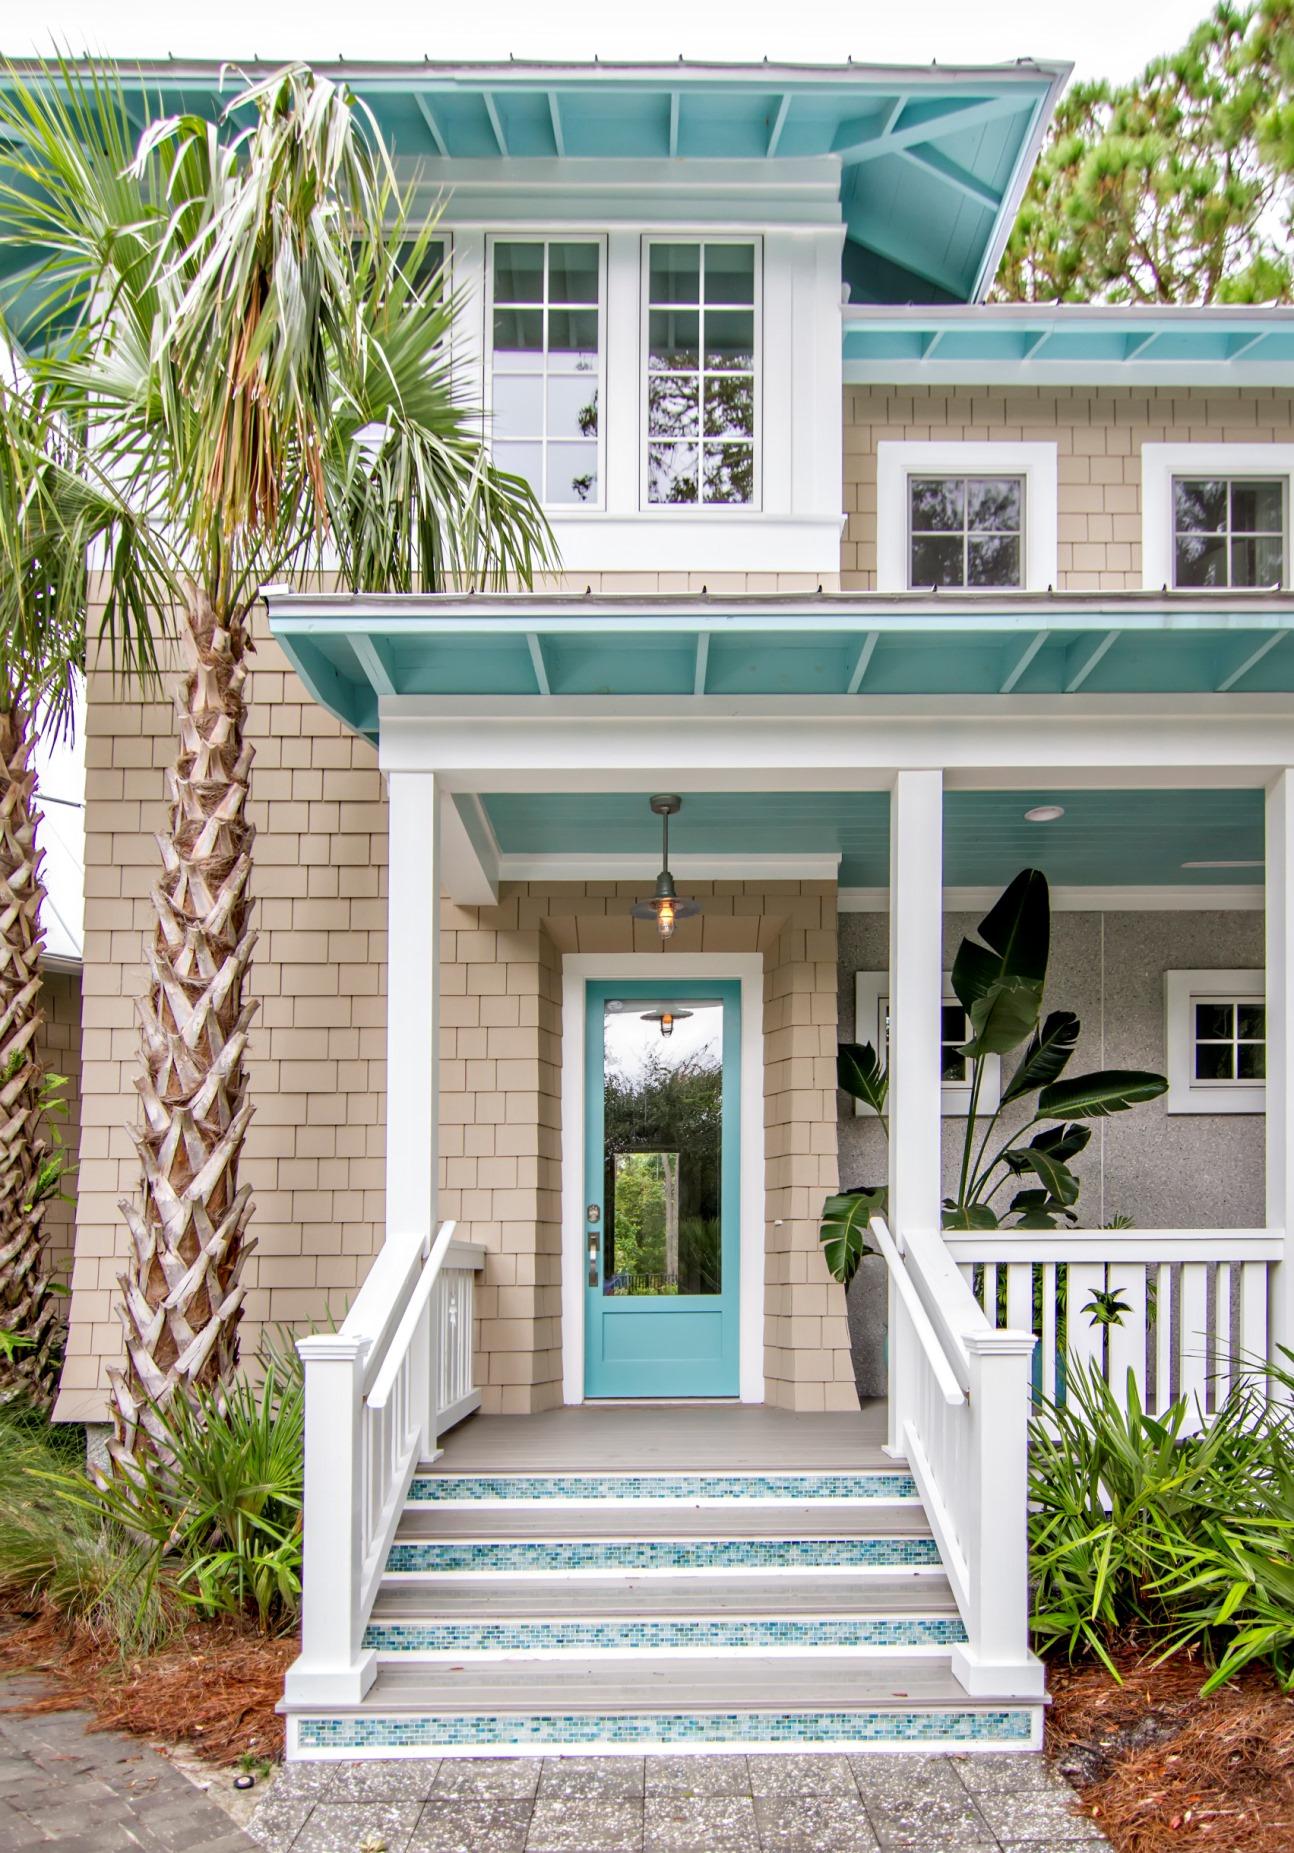 Glenn Layton Homes in South Ponte Vedra Beach